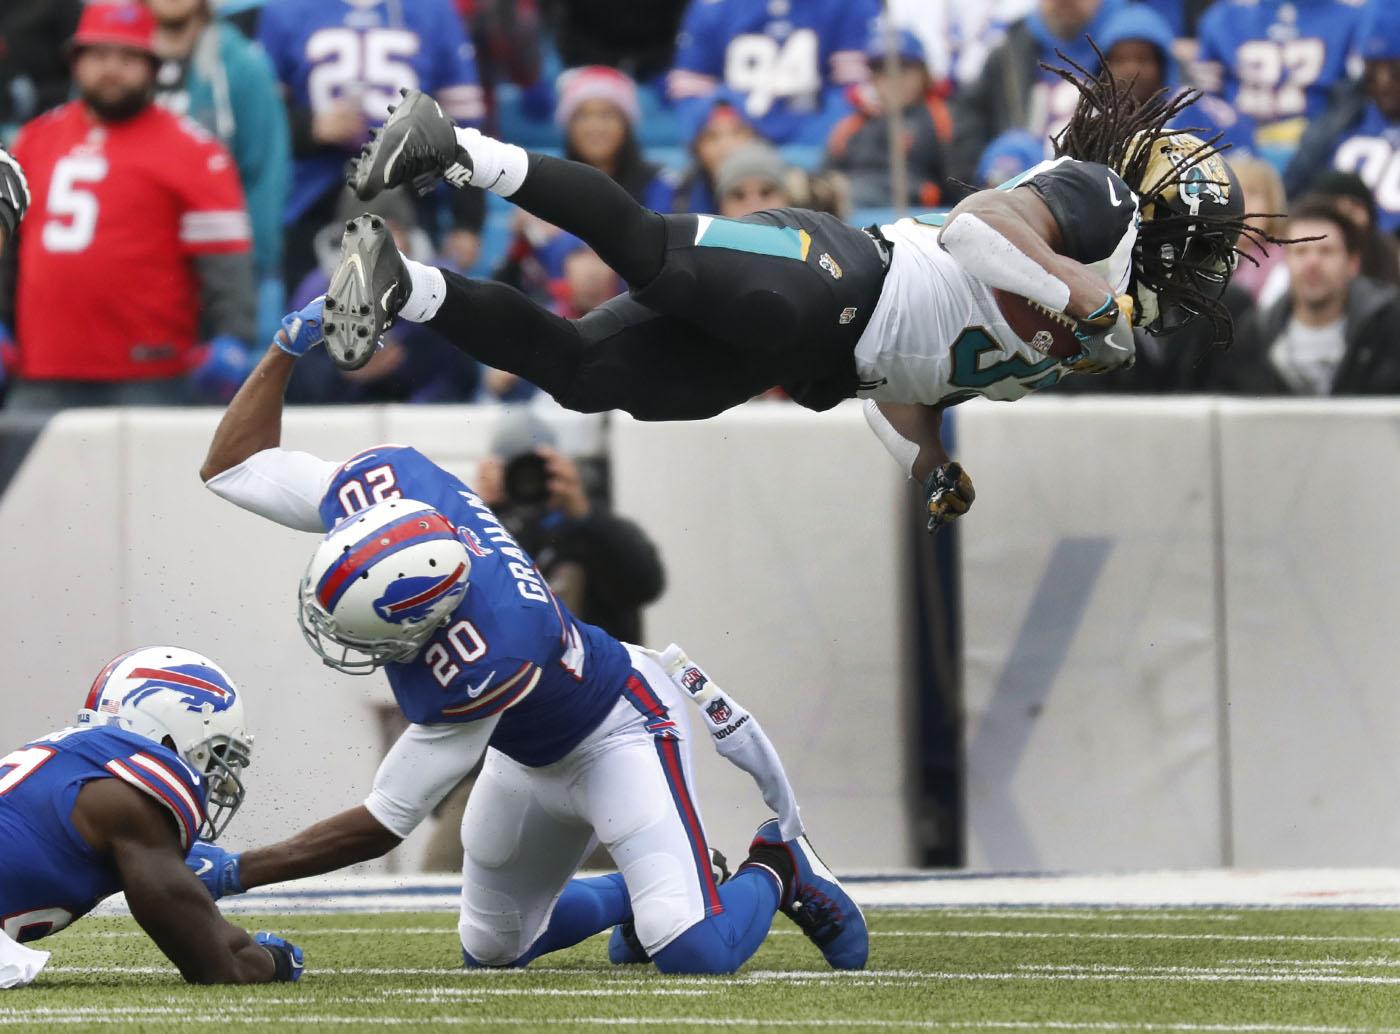 Buffalo Bills Corey Graham cannot tackle Jacksonville Jaguars Chris Ivory during first quarter action at New Era Field on Sunday, Nov. 27, 2016.(Harry Scull Jr./Buffalo News)